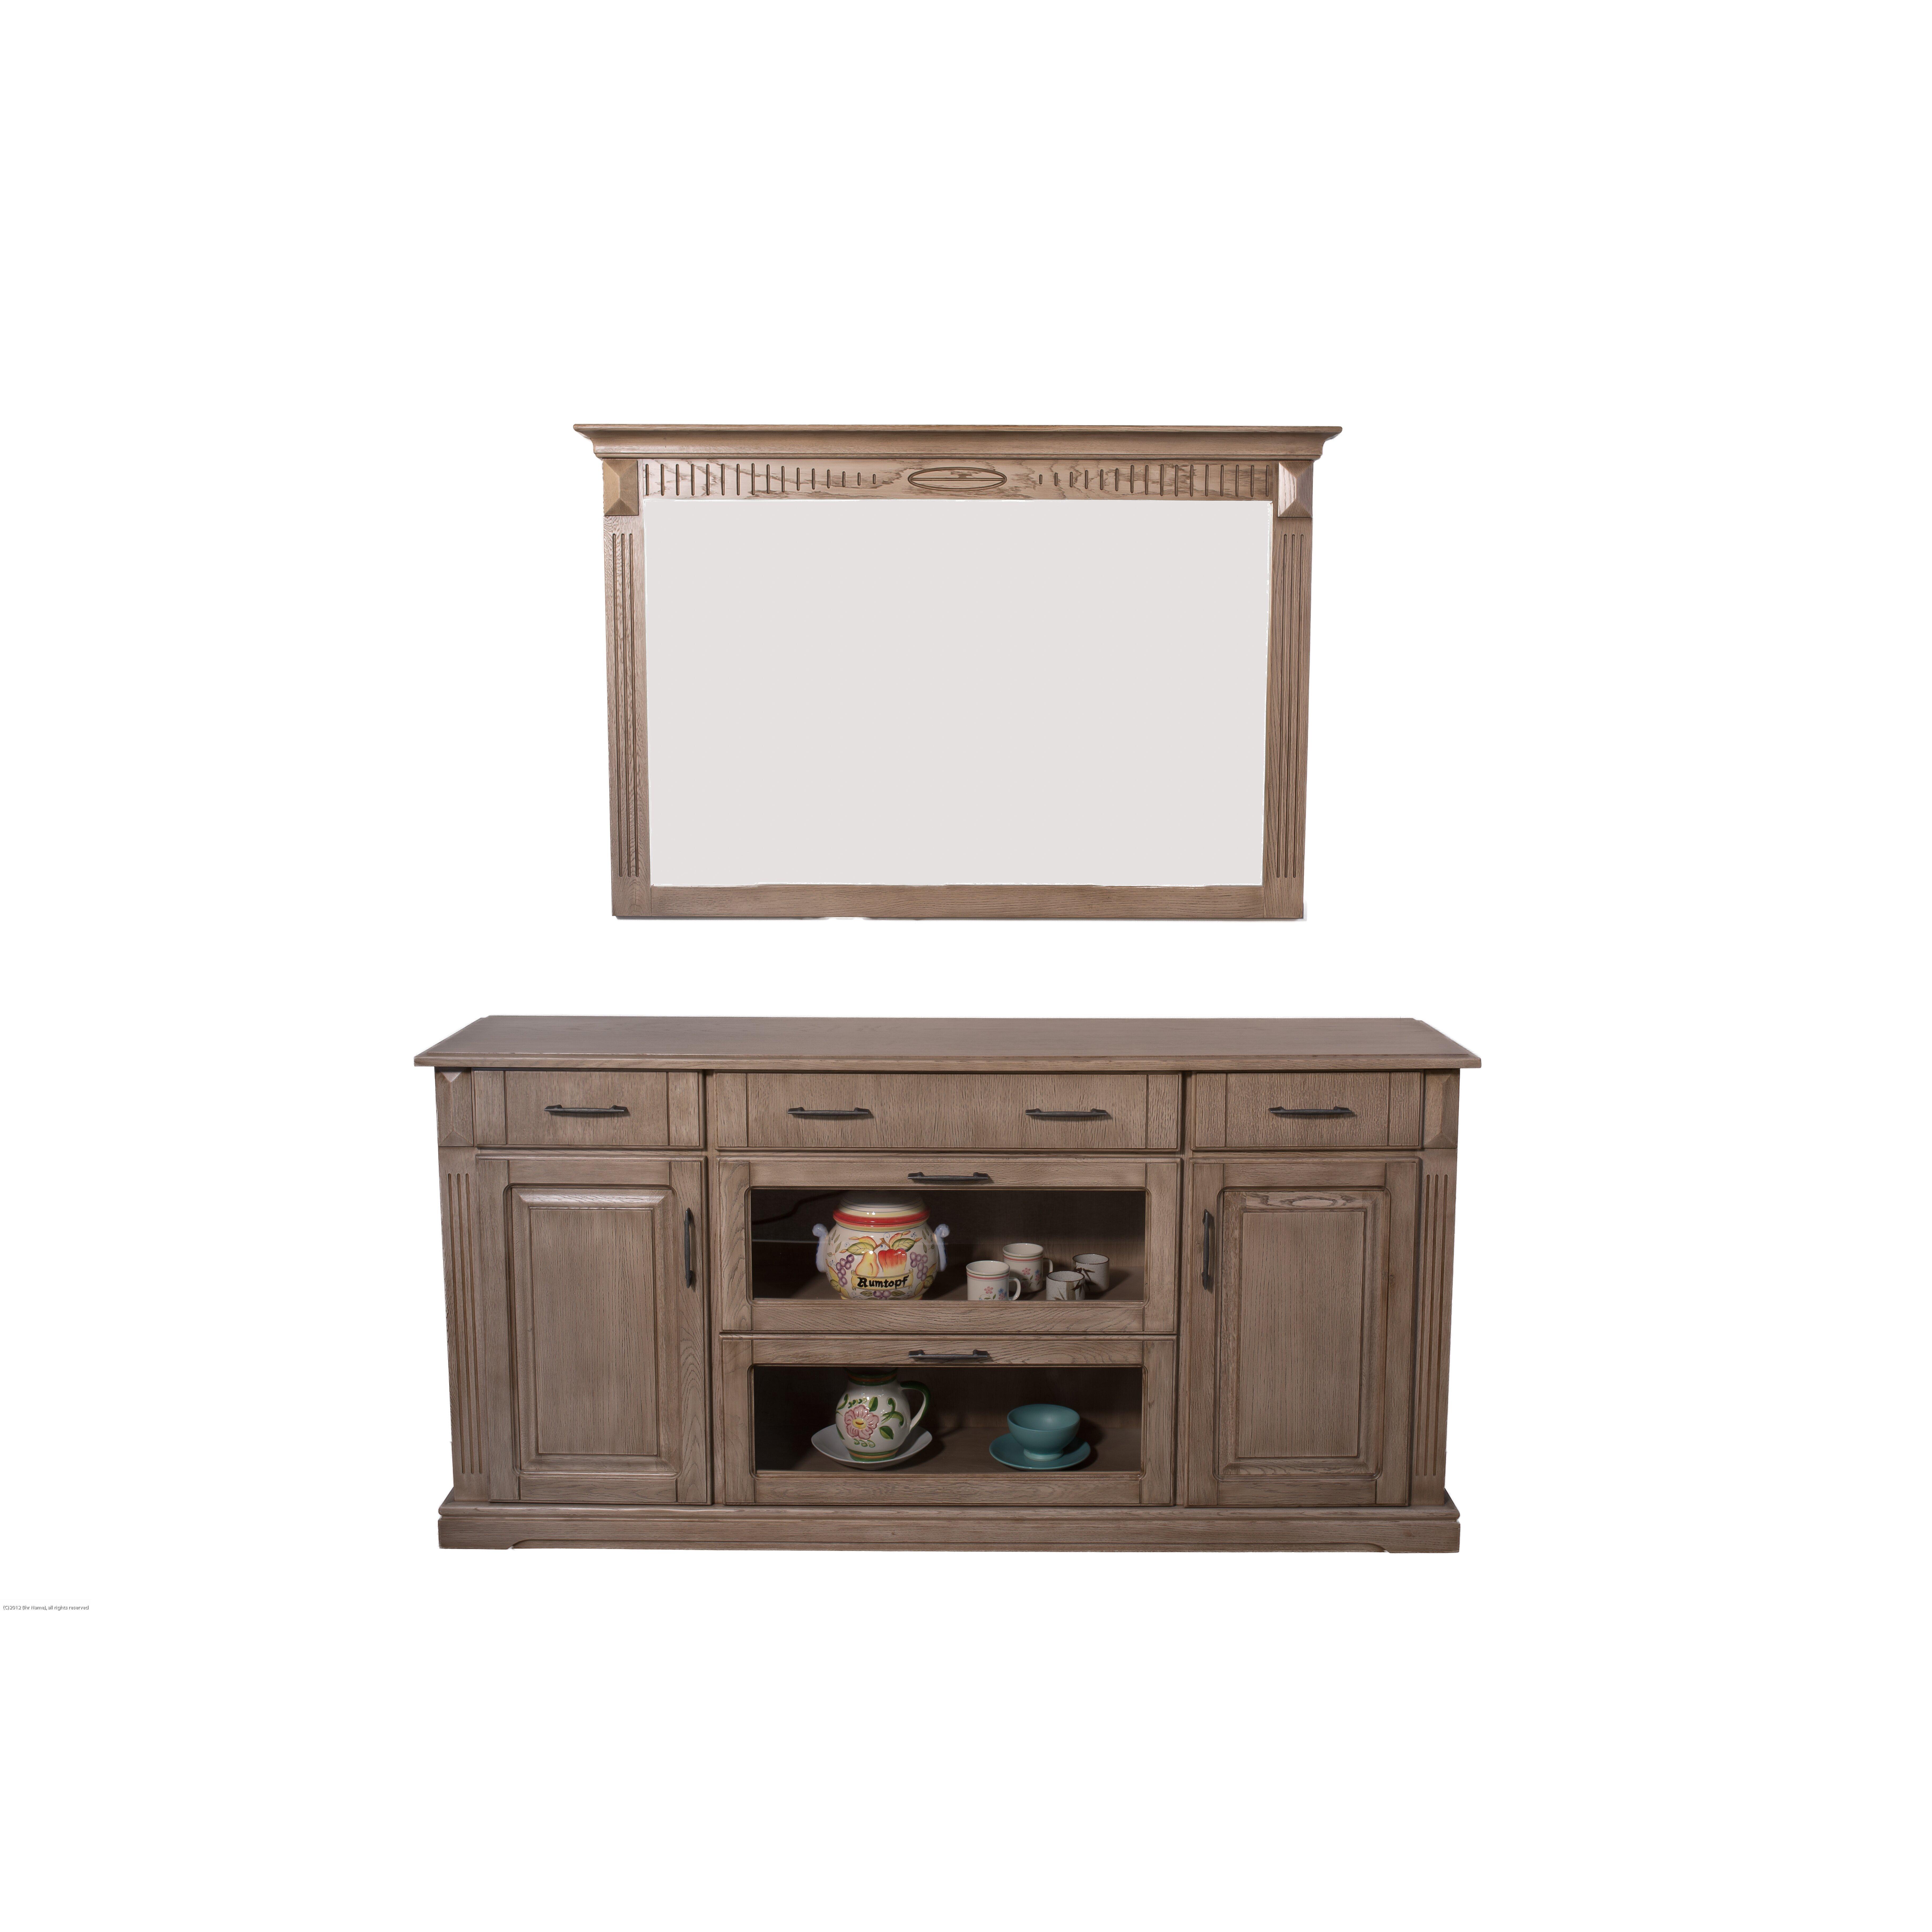 caracella wandspiegel kufstein. Black Bedroom Furniture Sets. Home Design Ideas